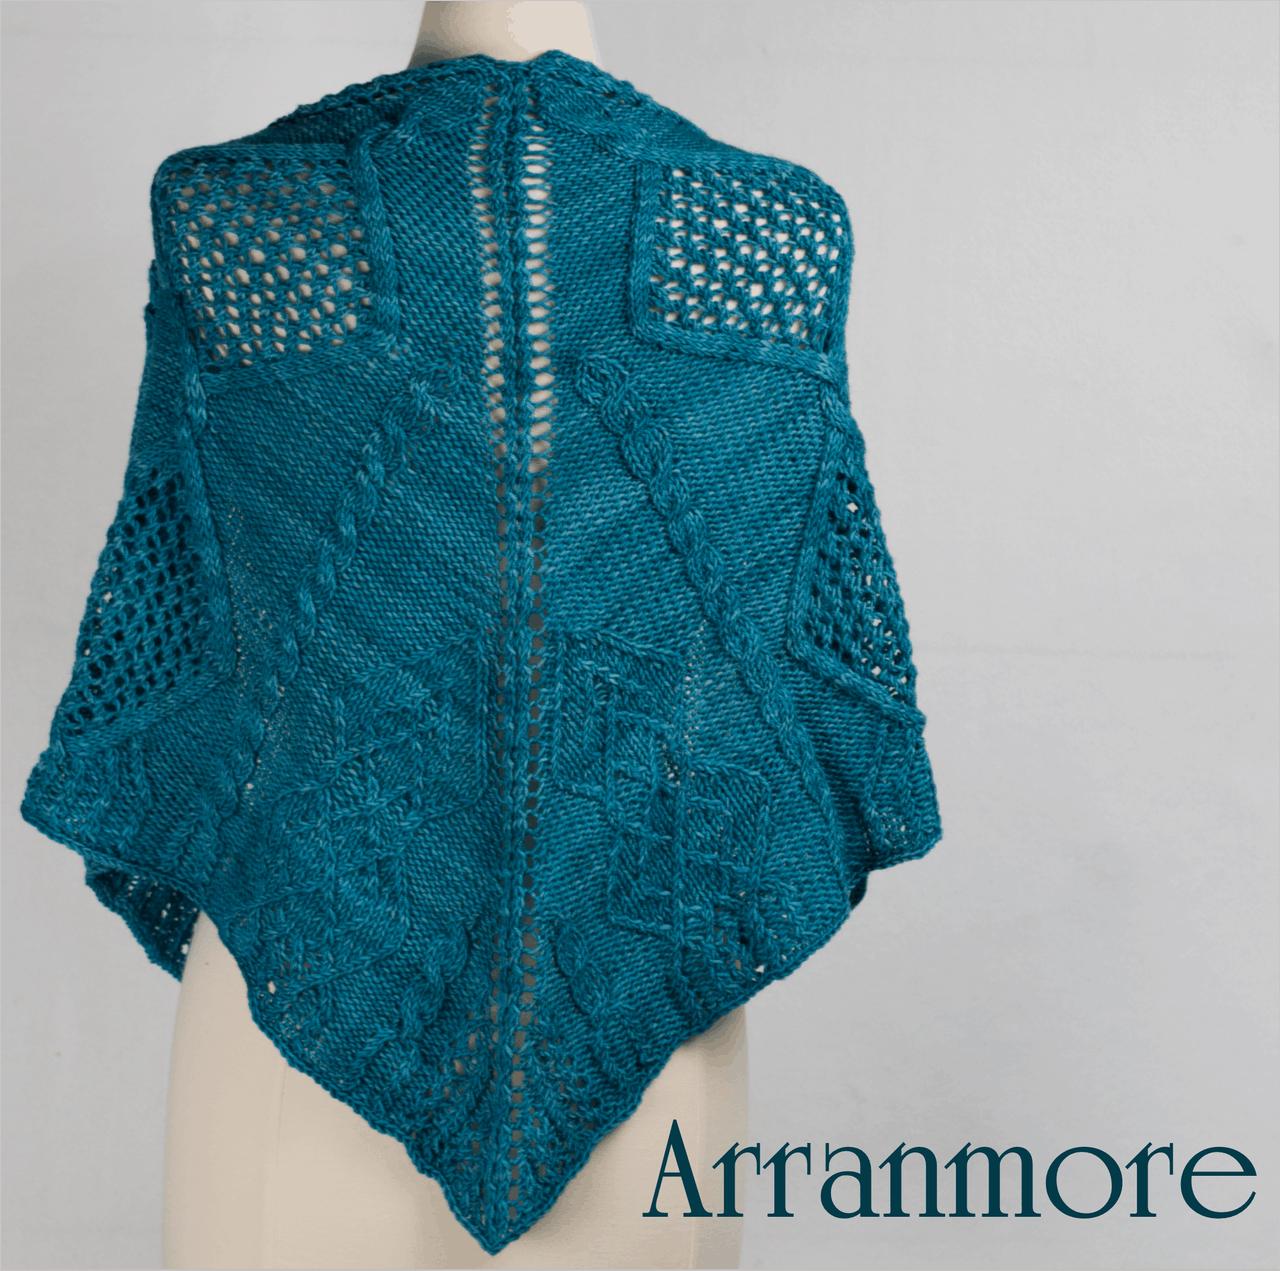 Arranmore Triangle Kit